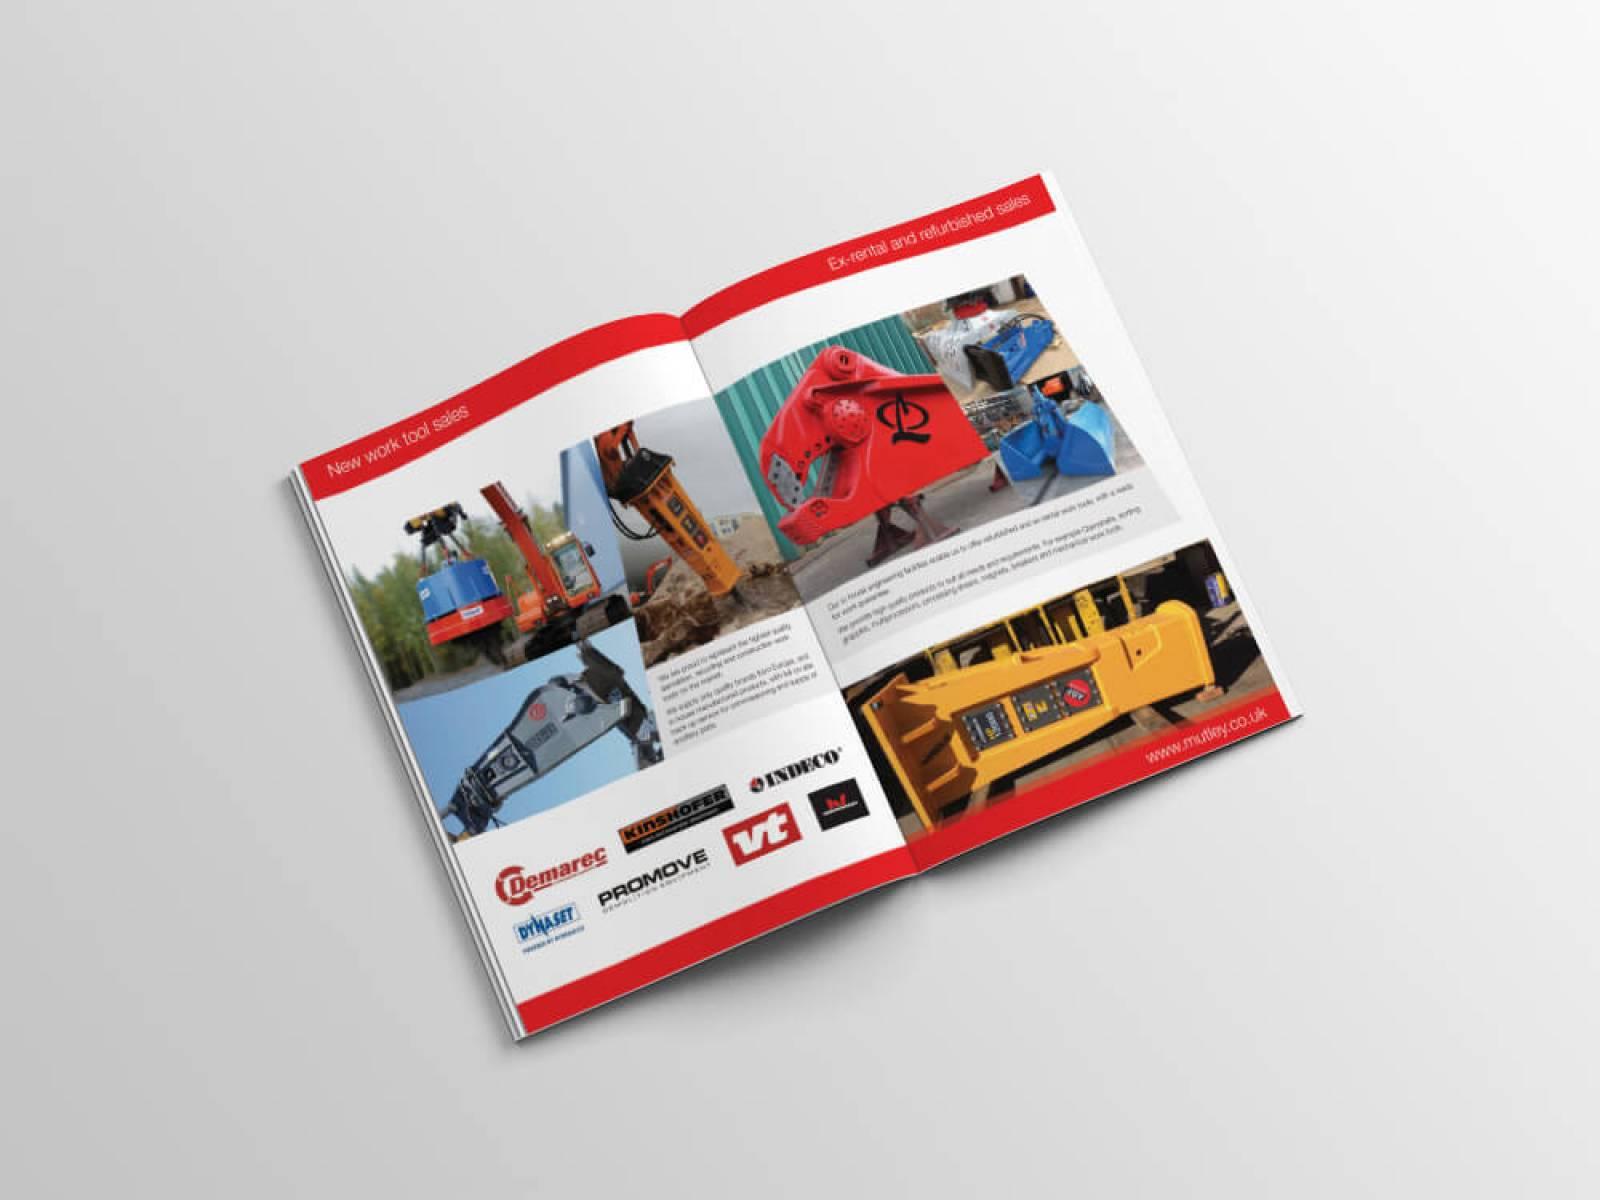 Mutley-flyer-5-design-agency-graphic-design-canterbury.jpg